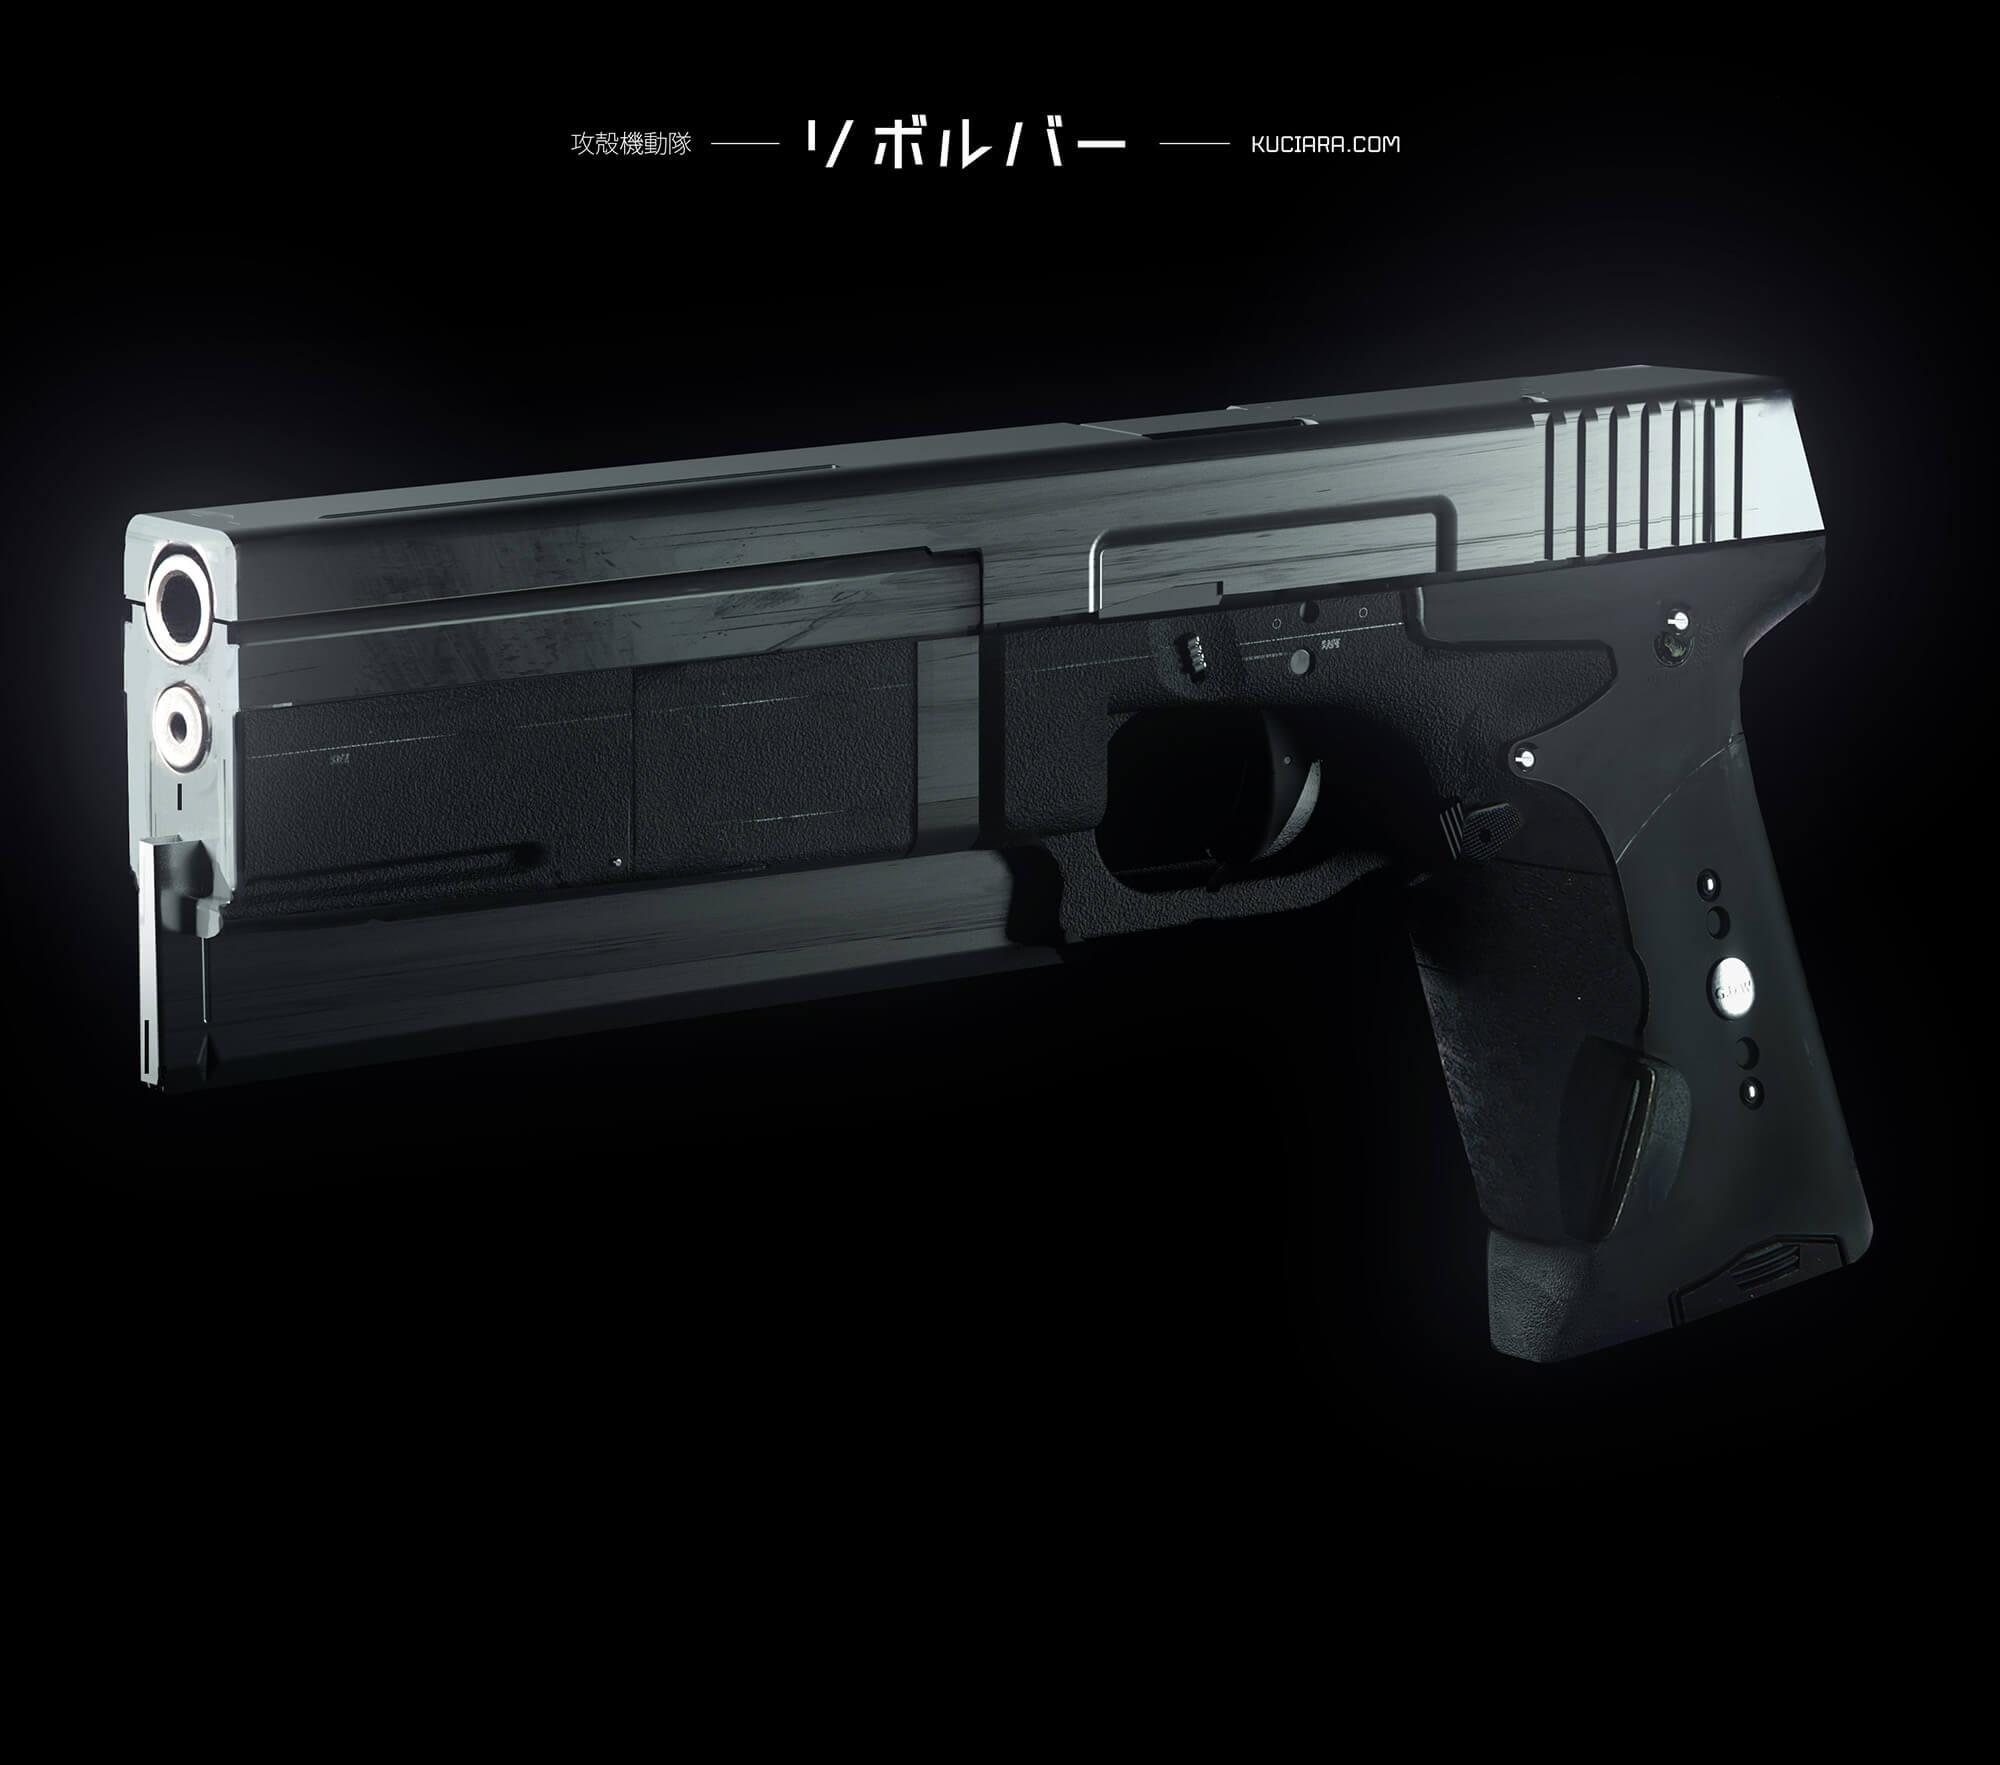 092915_WPN_Batou_Pistol_MK_v001